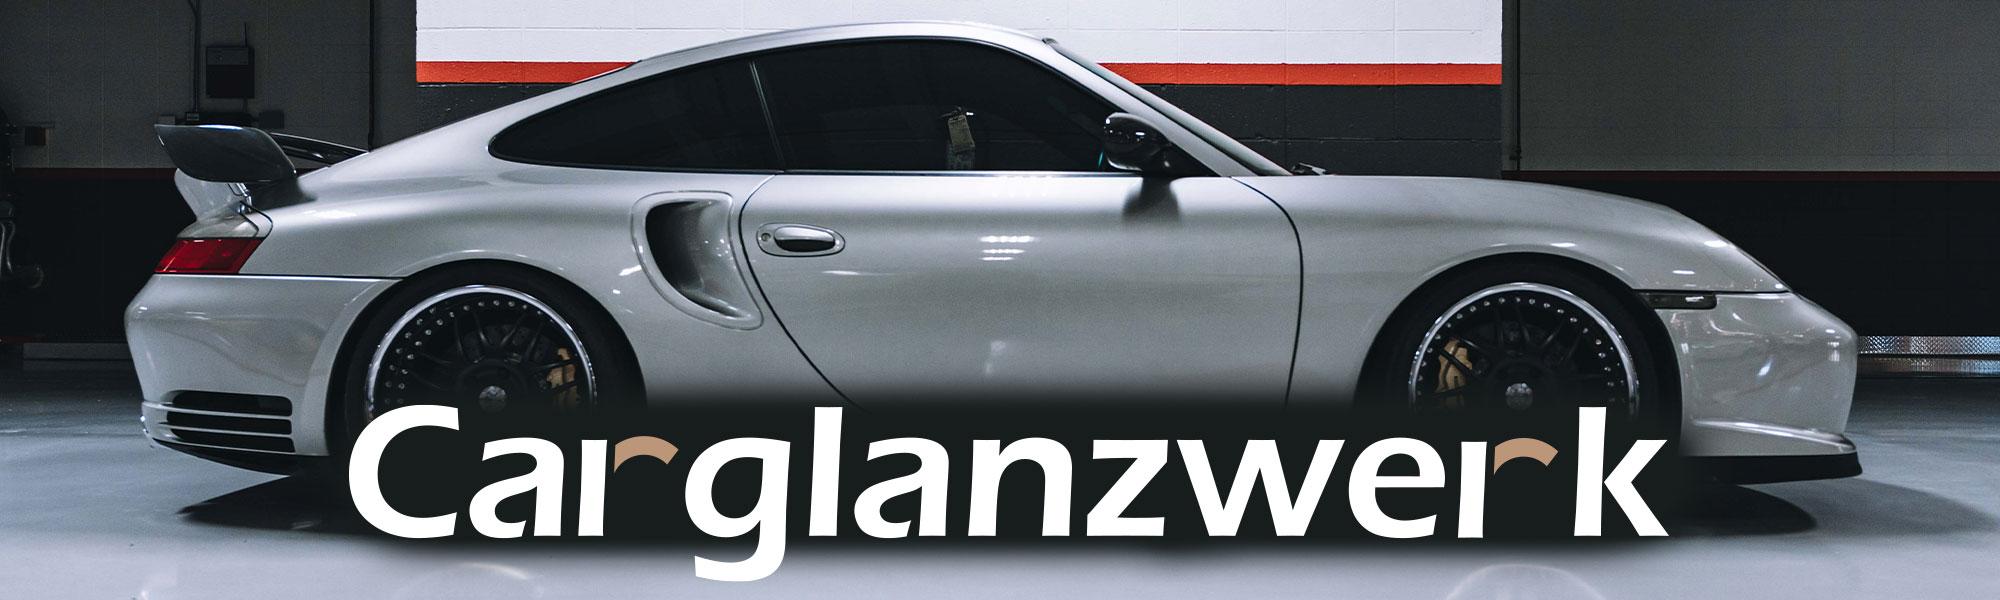 Carglanzwerk Krefeld Banner